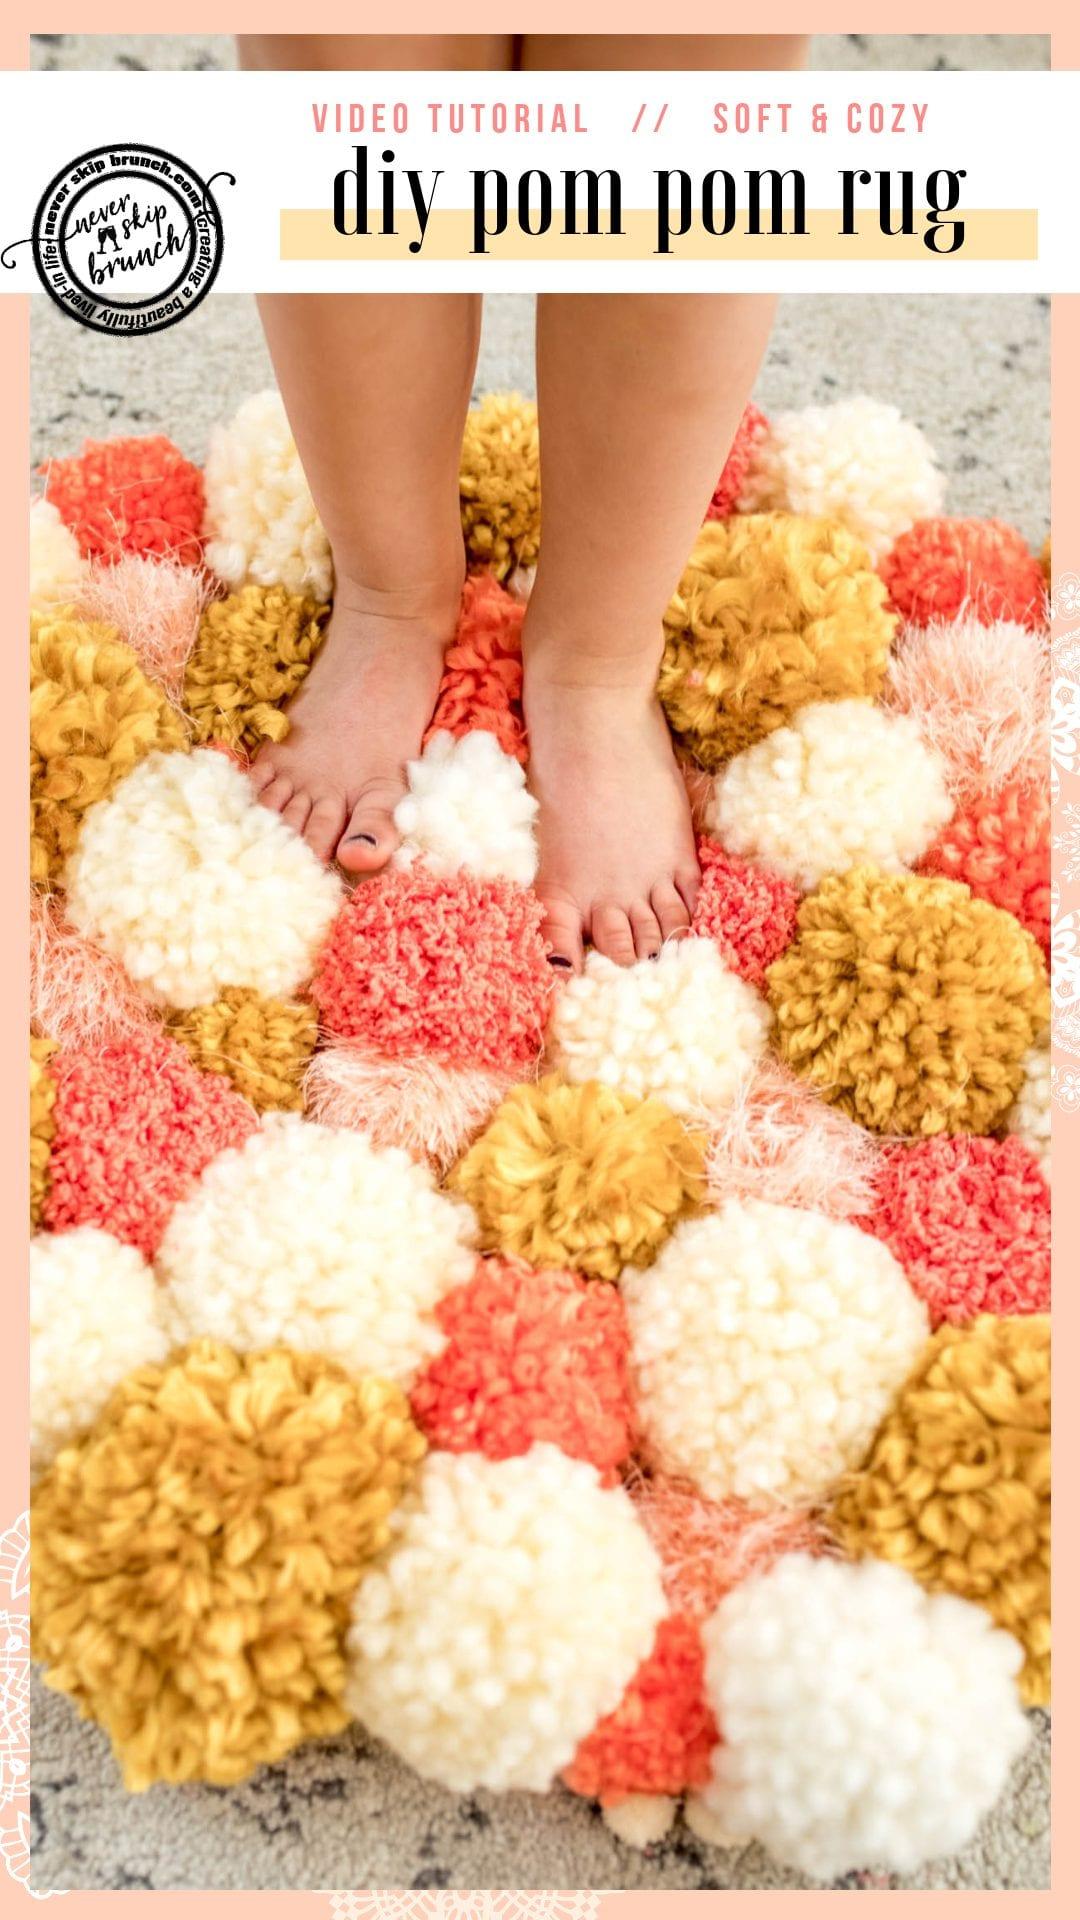 SO CUTE & SOFT! | pom pom rug tutorial video | pom pom rug tutorial | pom pom rug DIY | DIY Ideas | DIY Projects | pom pom rug diy ideas | Easy DIY Projects Yarn | Yarn crafts | Never Skip Brunch by Cara Newhart Denver Blogger | #DIY #Crafts #decor #yarn